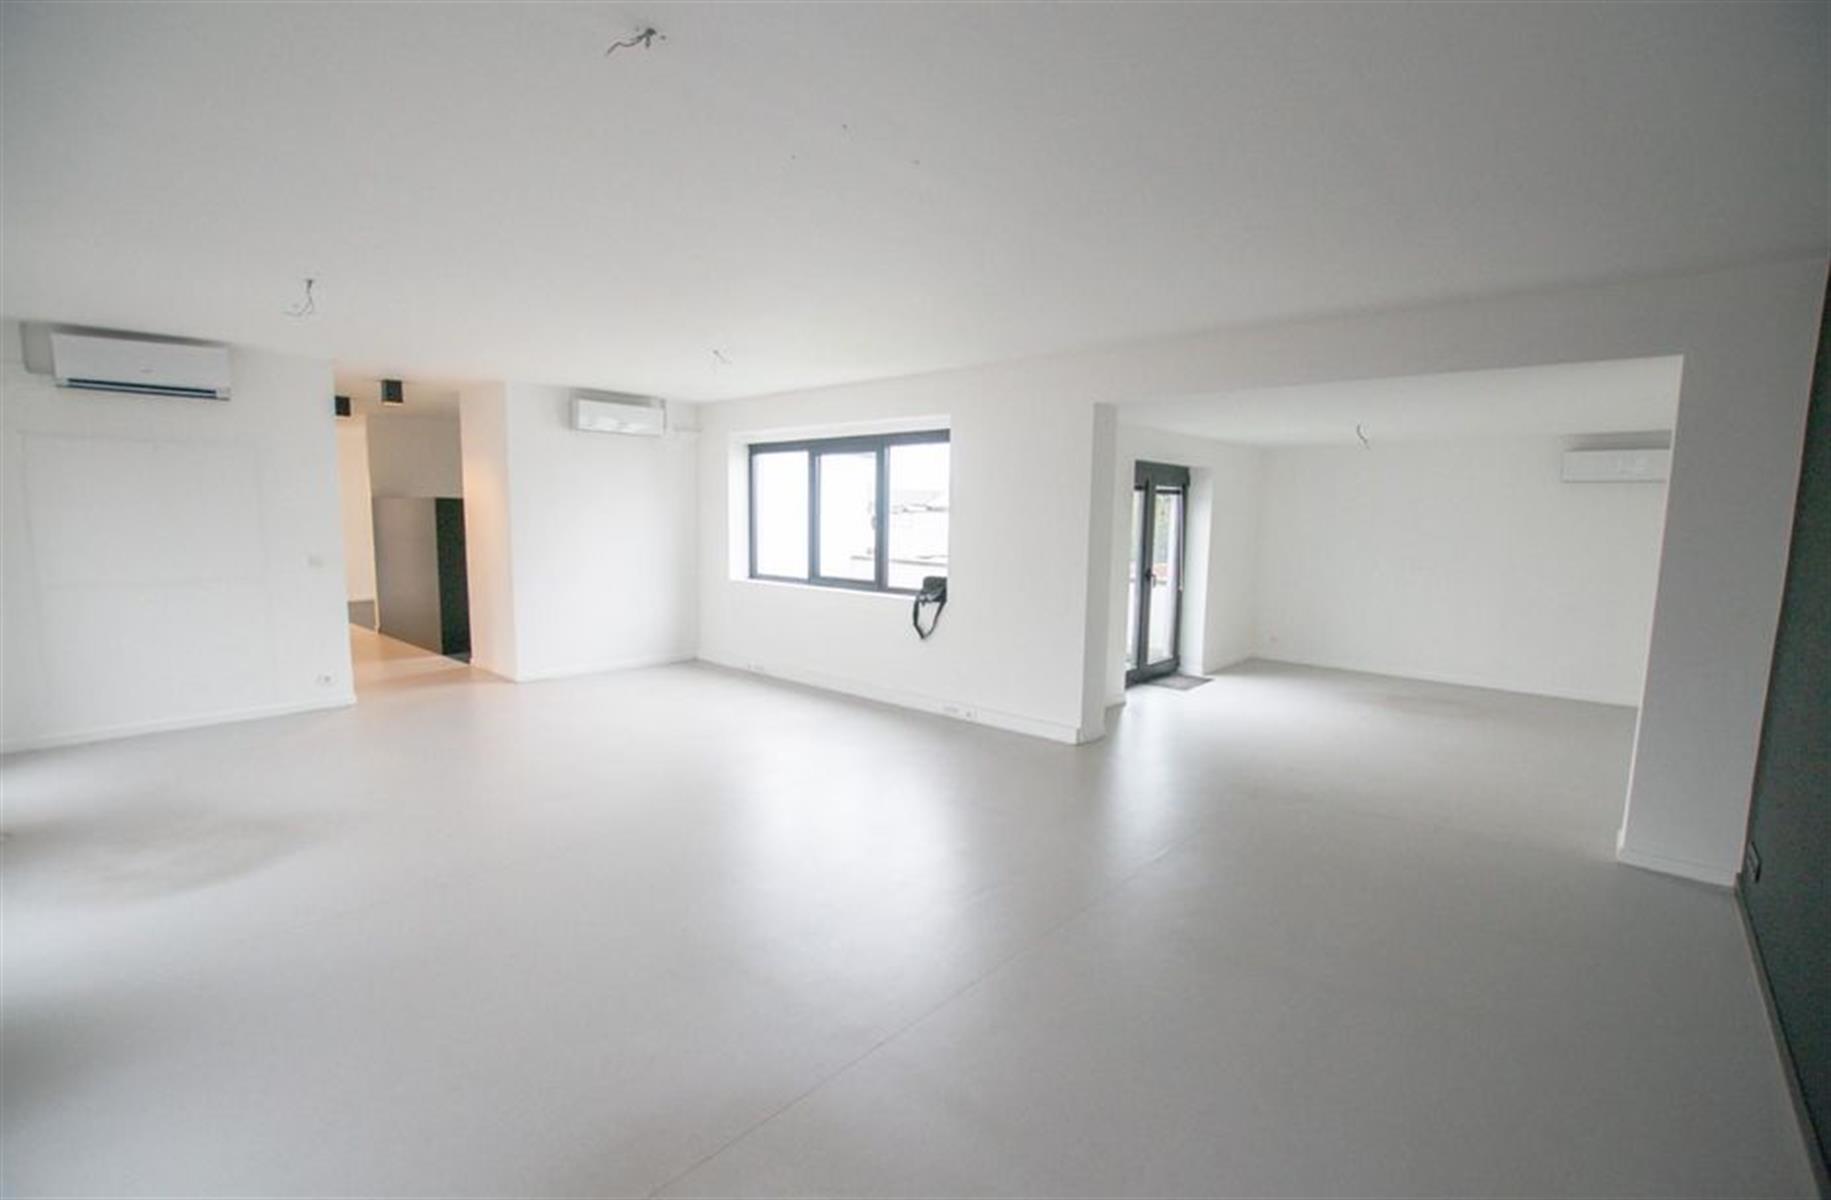 kantoor te huur K003 - Middelmolenlaan 96, 2100 Antwerpen Deurne, België 4